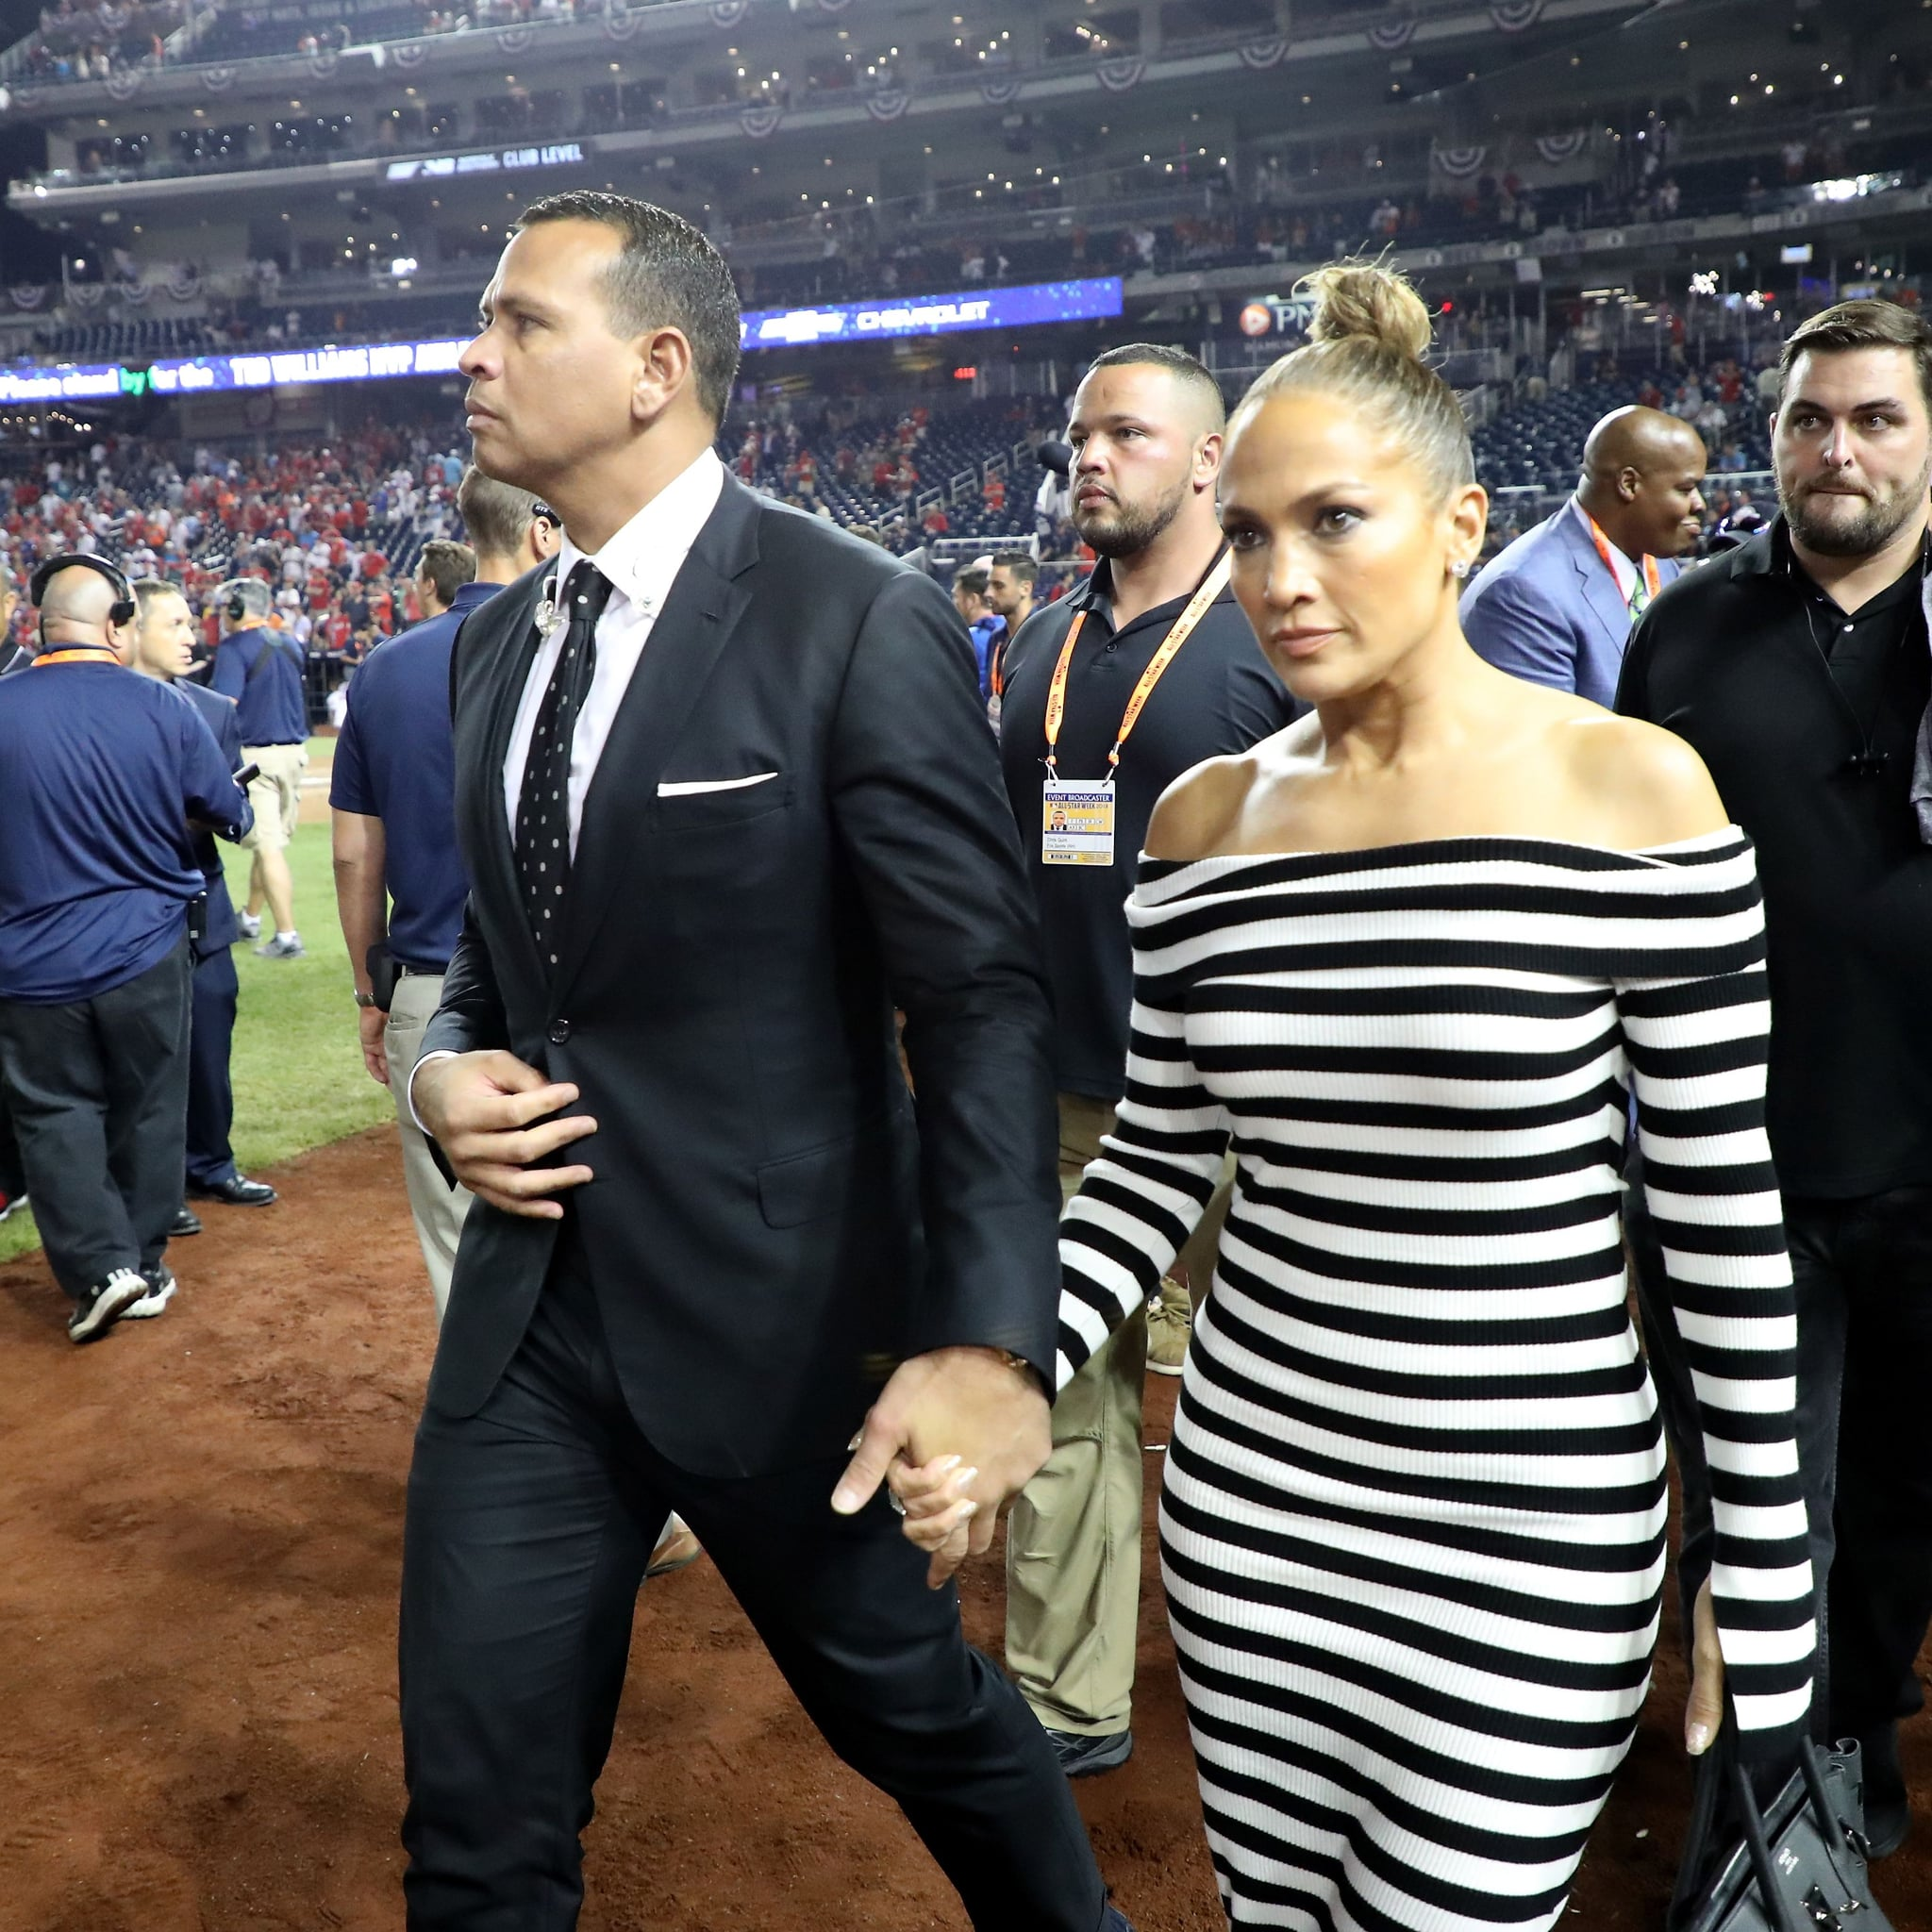 faec8a2d866 Jennifer Lopez s Striped Dress at Baseball Game 2018